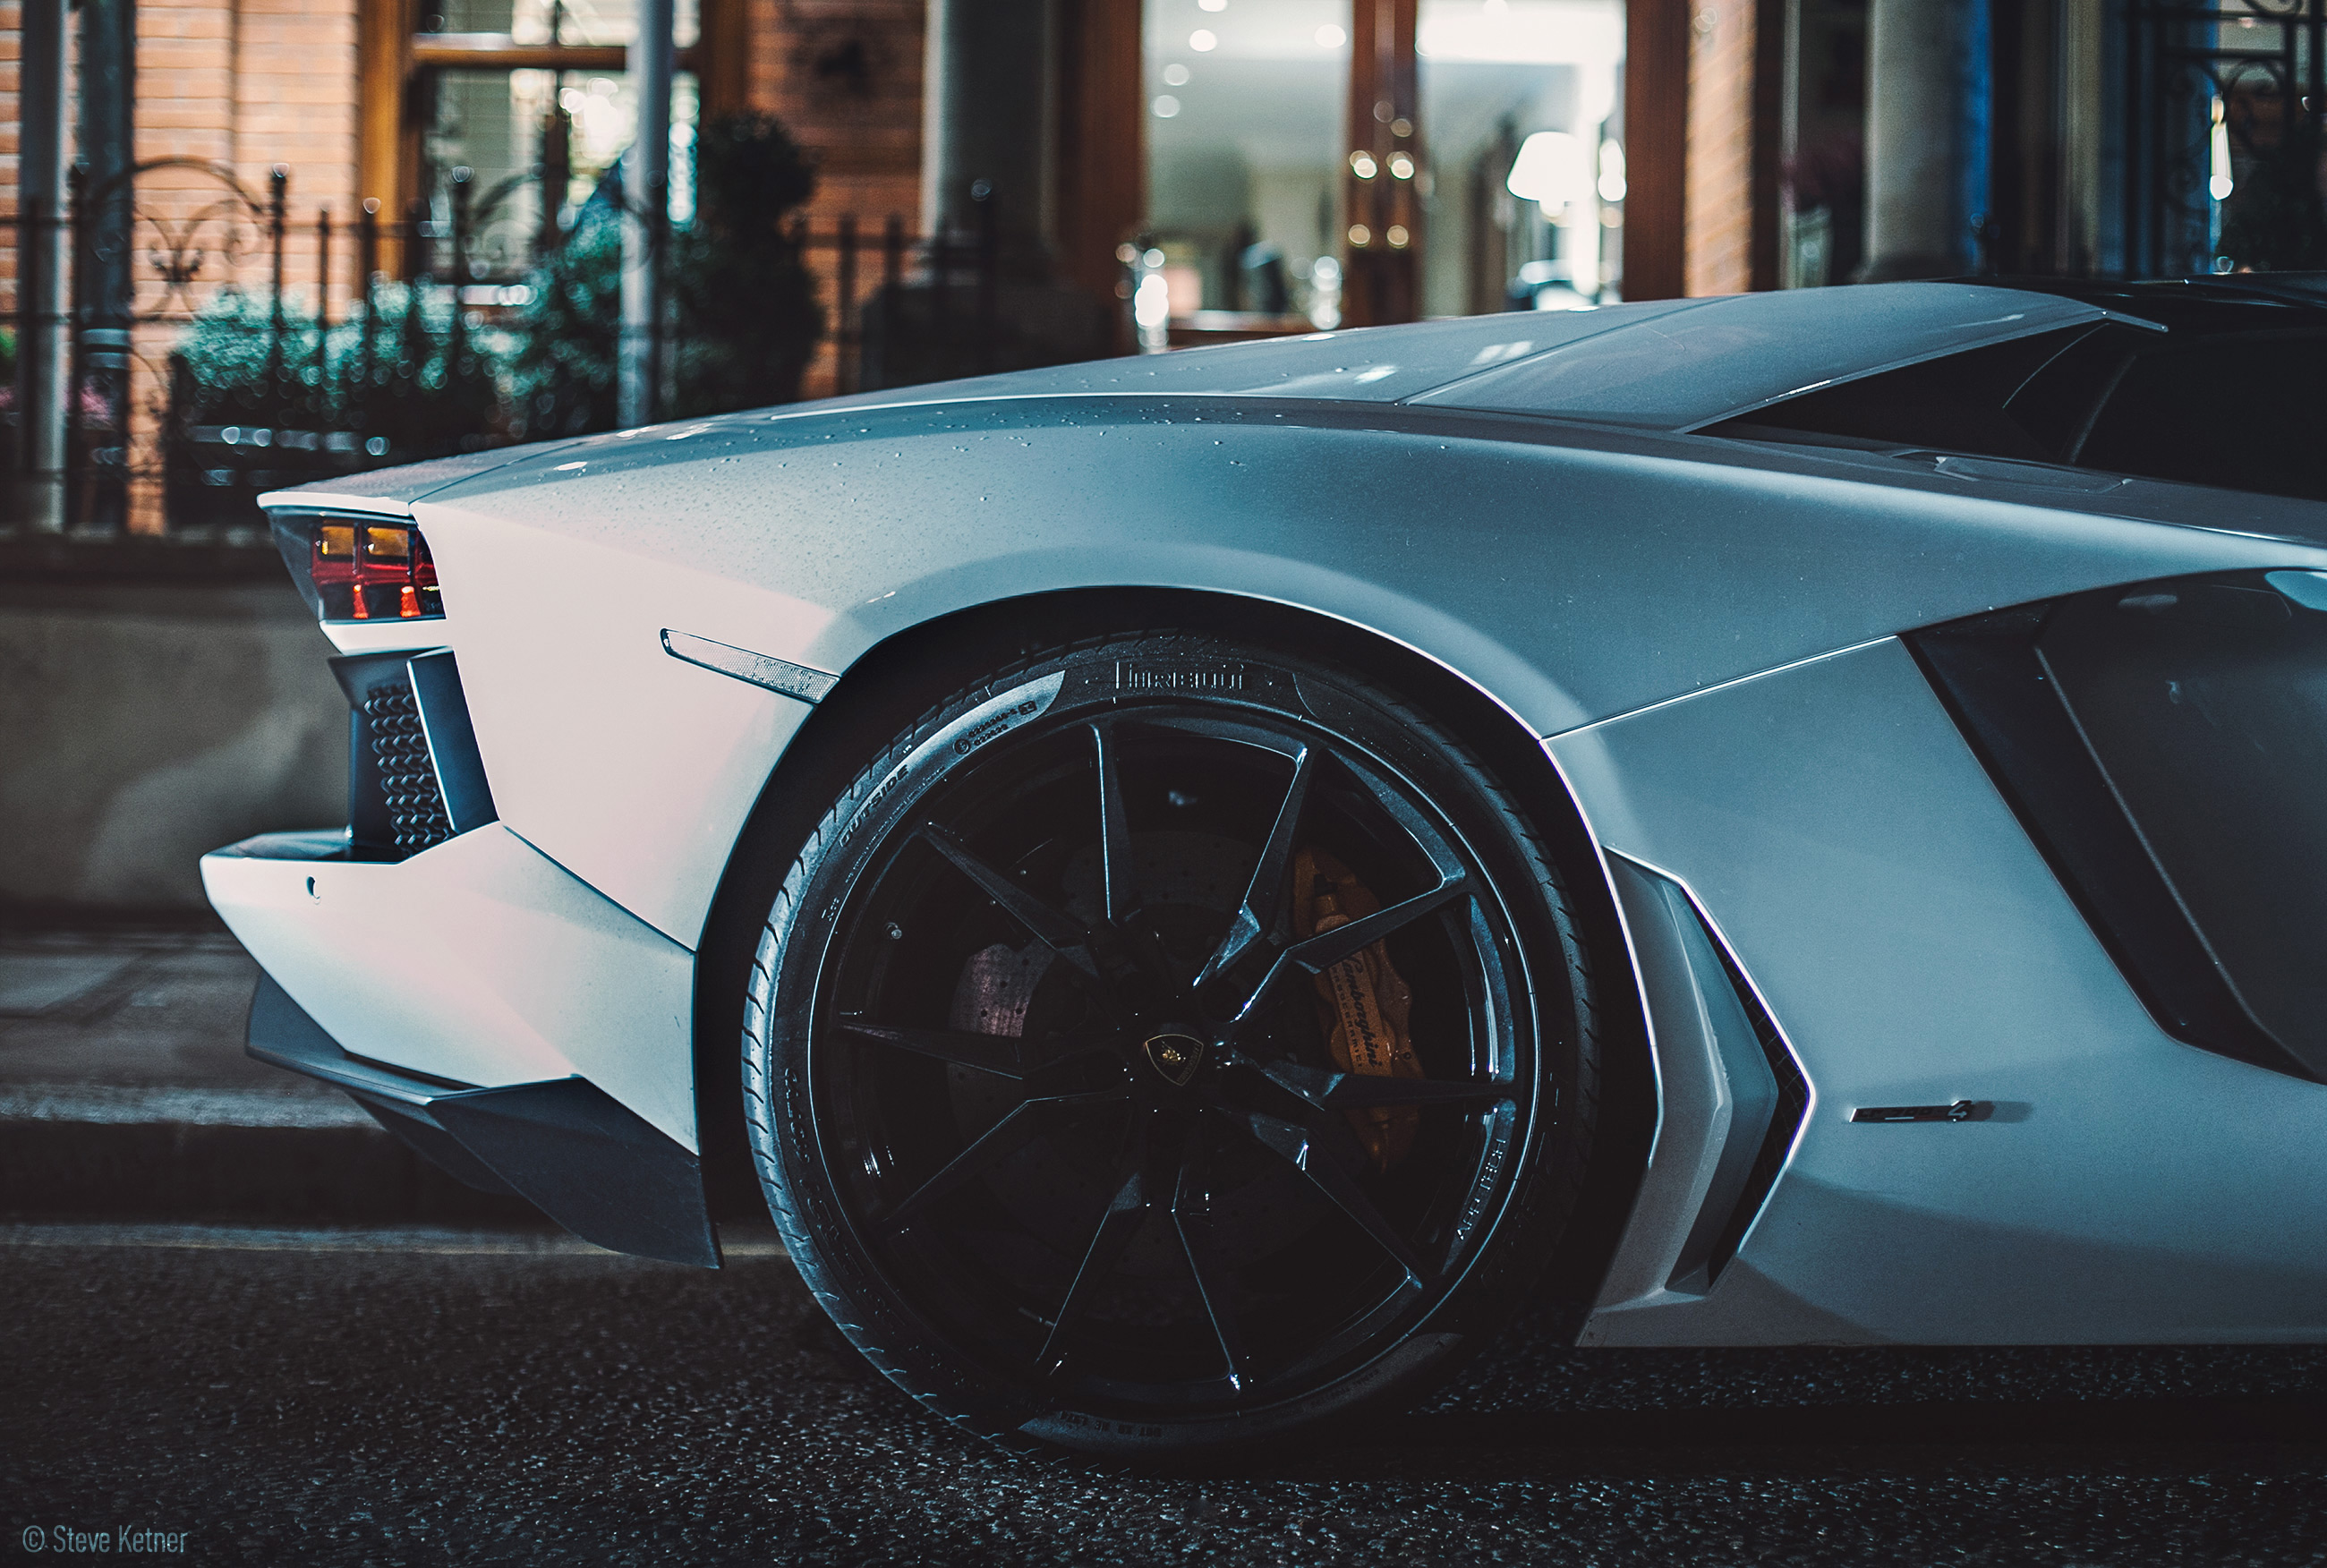 Steve Ketner - Lamborghini Aventador LP700-4 - London